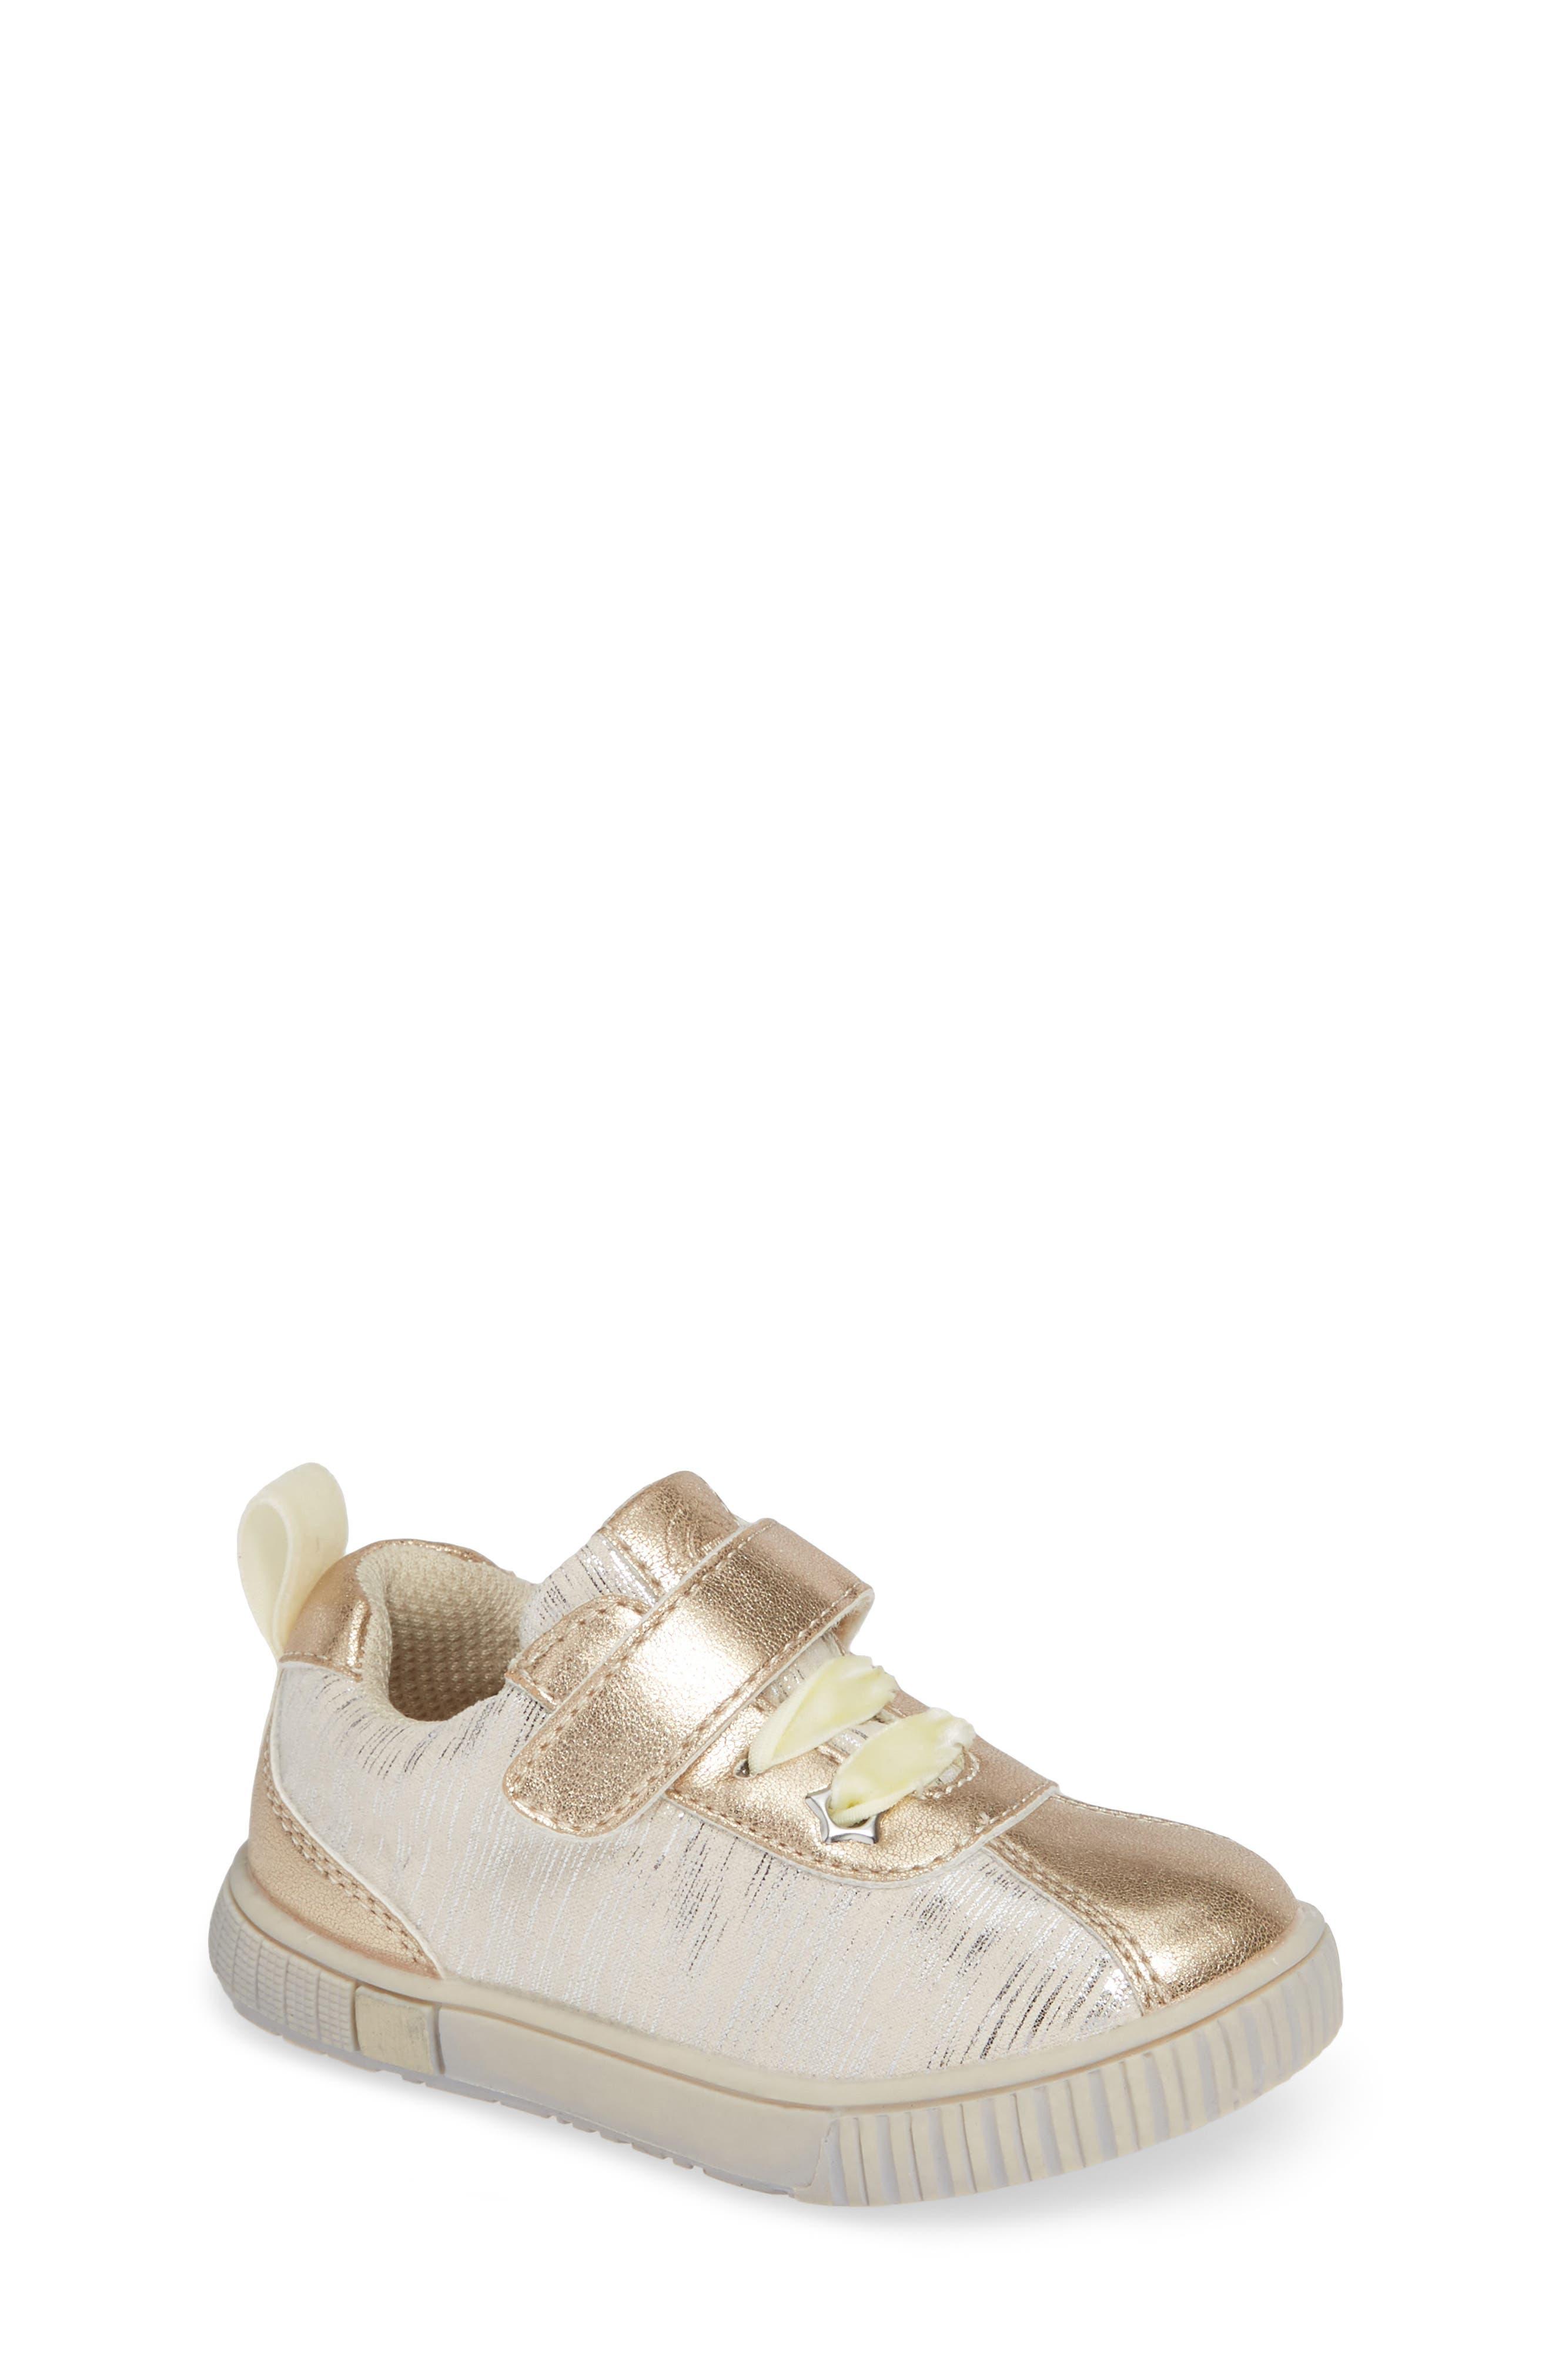 Toddler Girls Livie  Luca Spin Metallic Sneaker Size 10 M  Beige